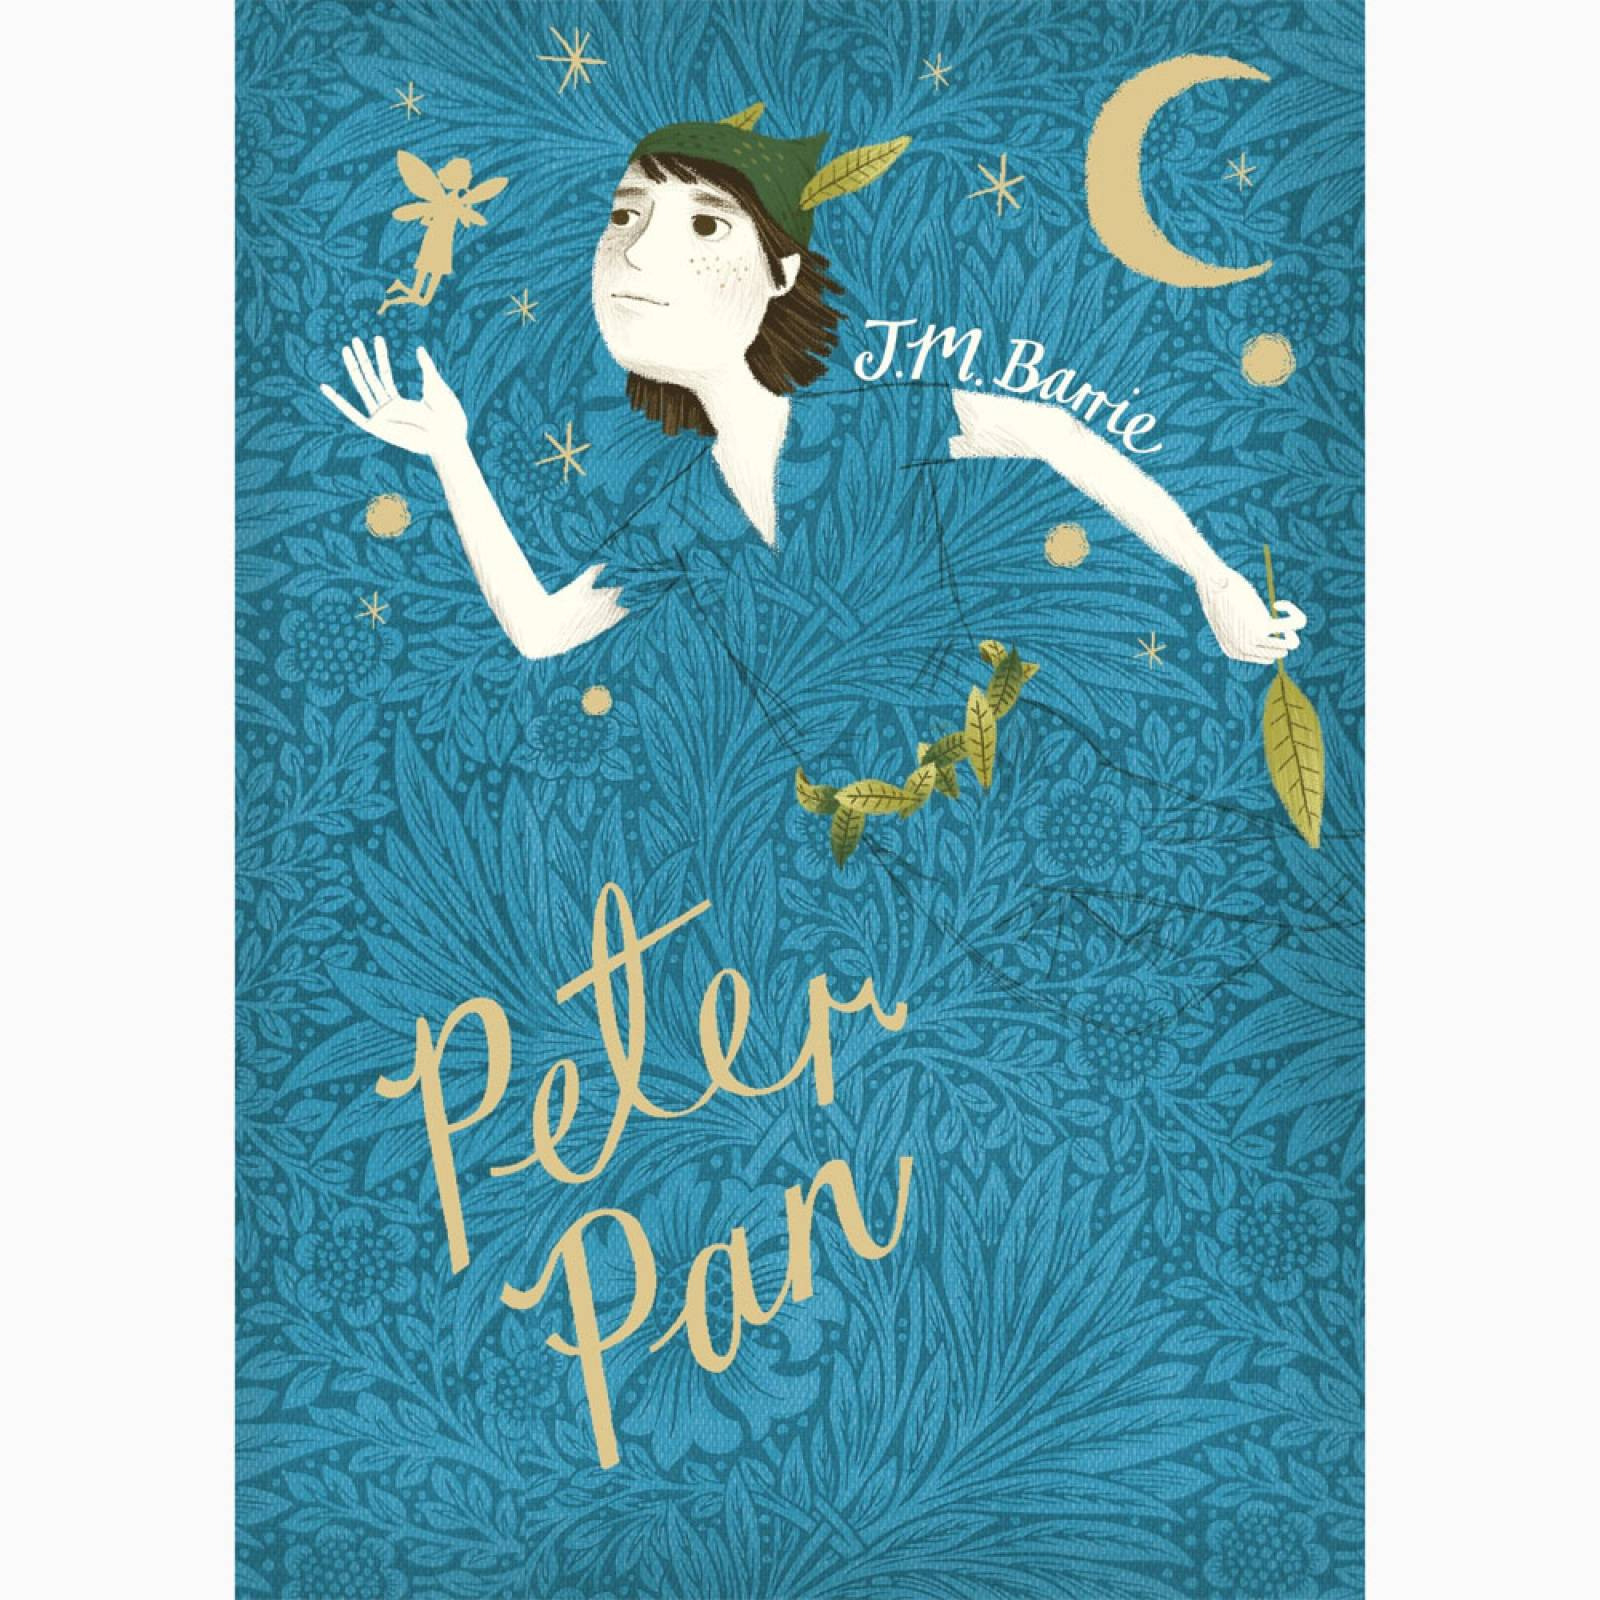 Peter Pan (V&A Edition) - Hardback Book